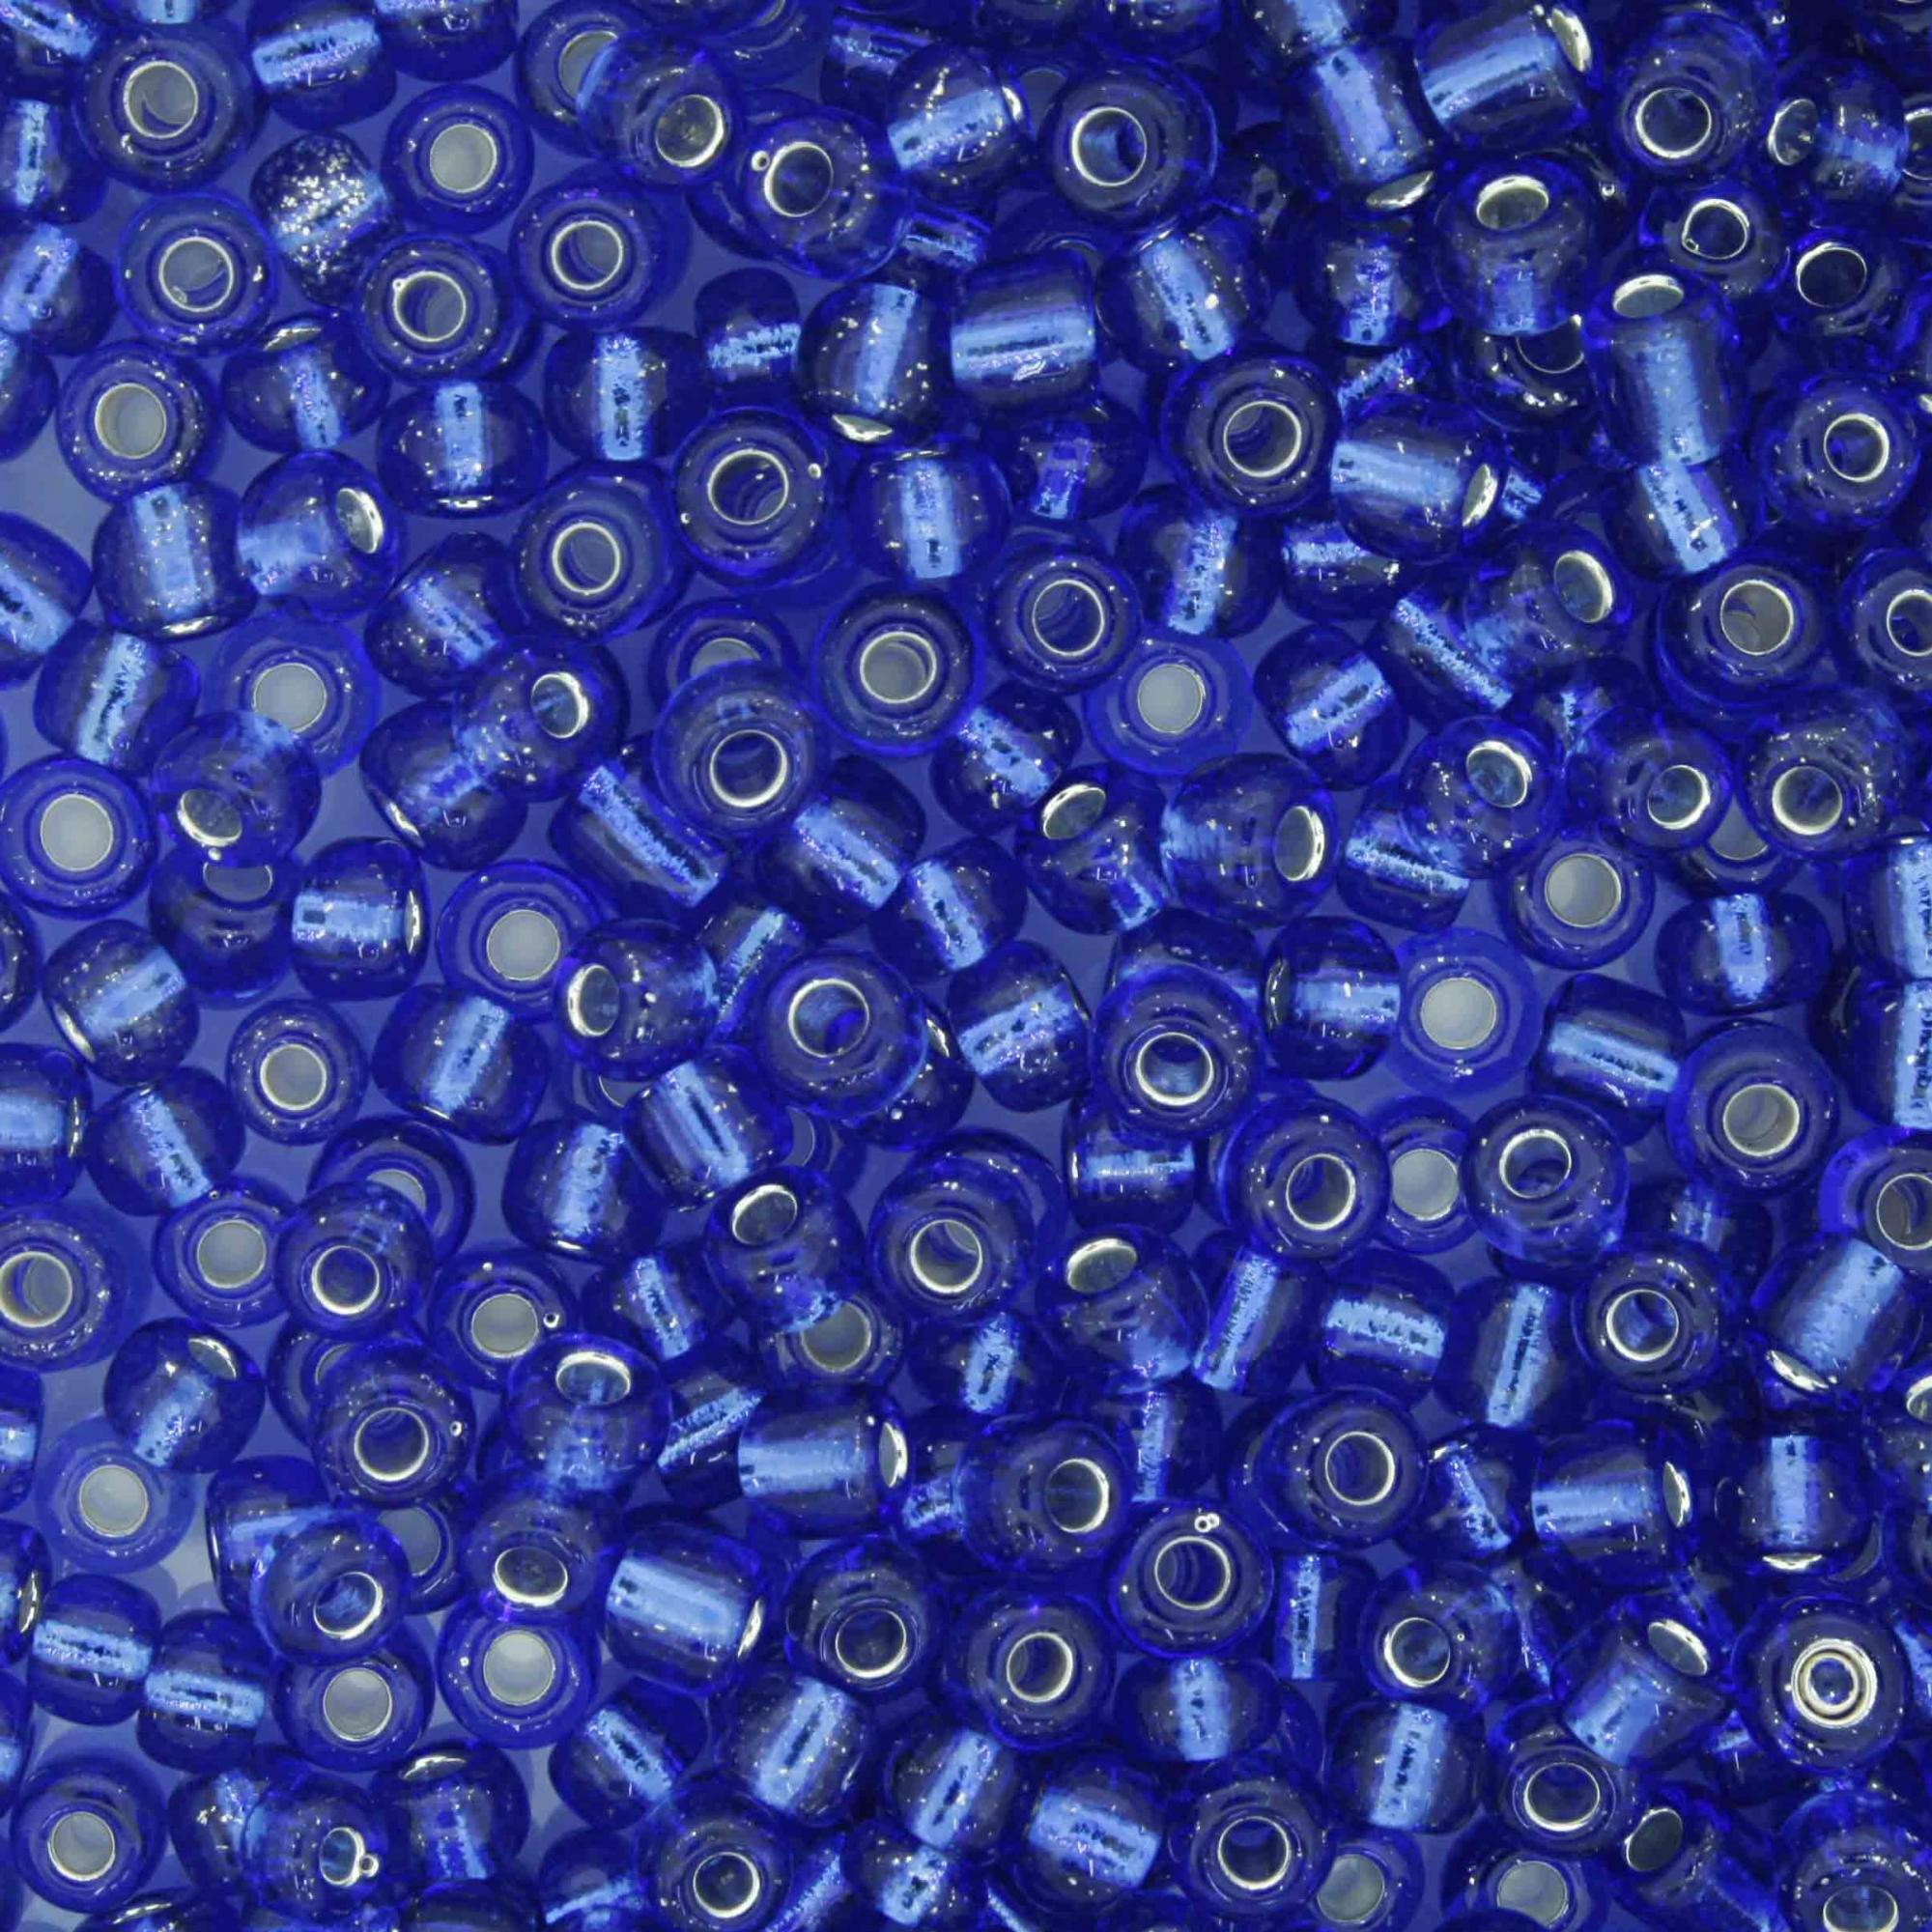 Miçanga - Azul Royal Transparente - 6/0 [4x3mm]  - Stéphanie Bijoux® - Peças para Bijuterias e Artesanato